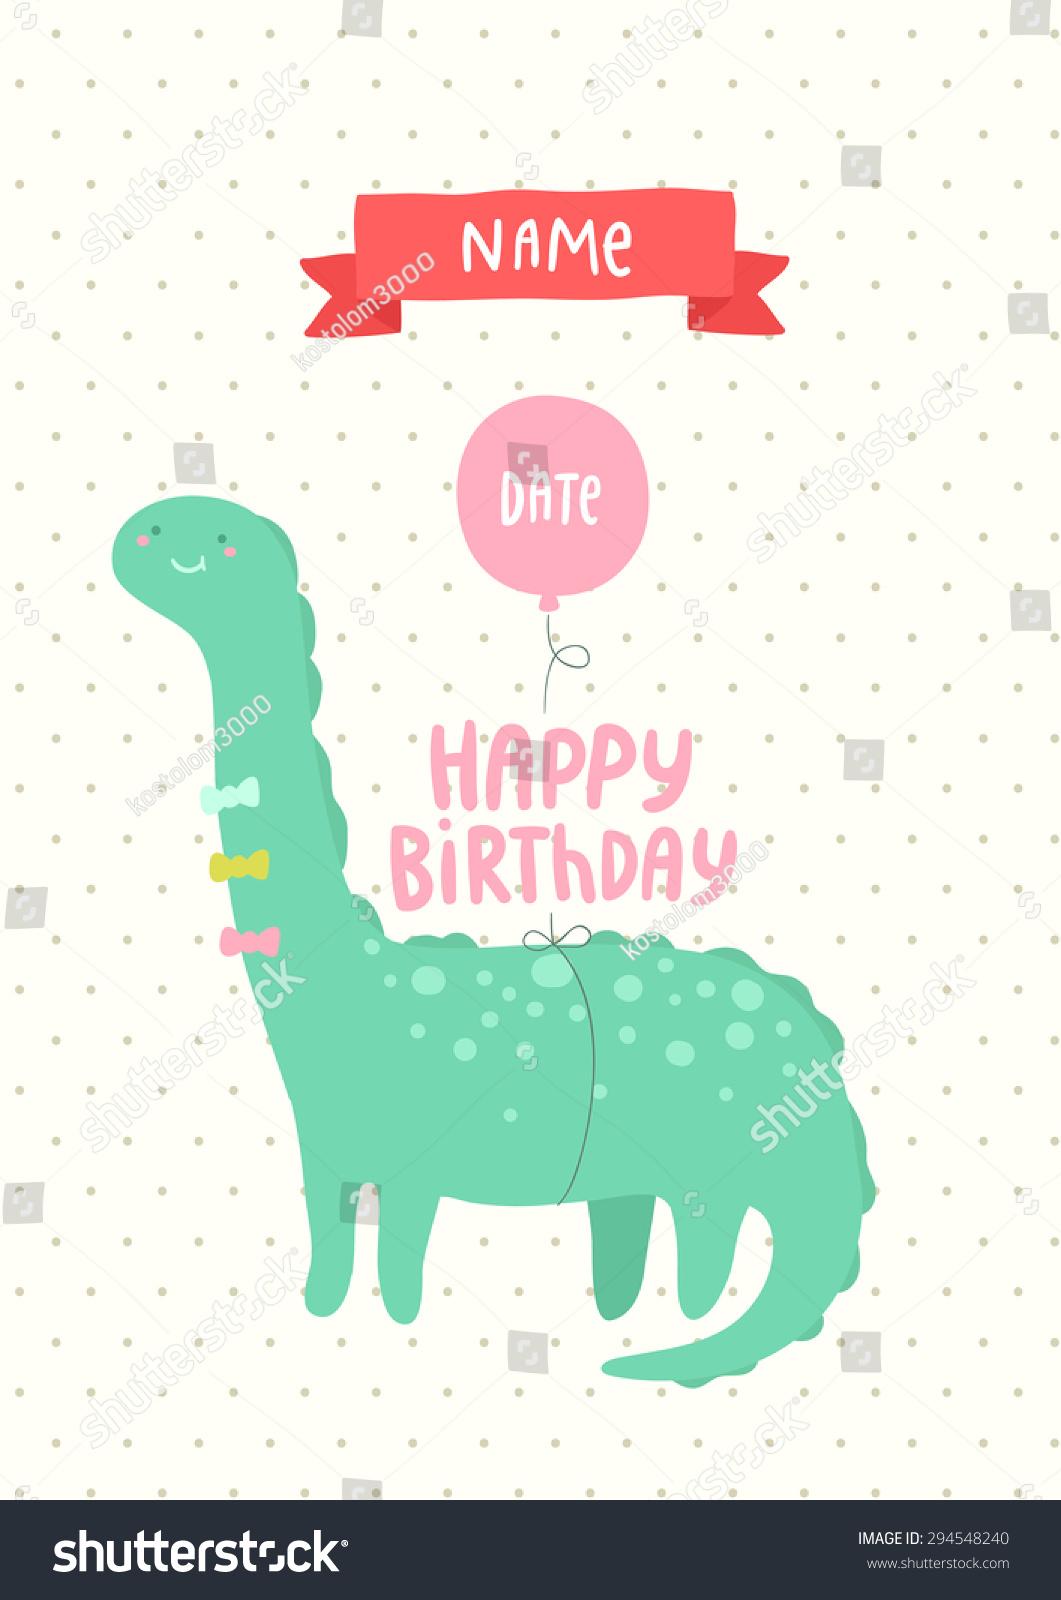 Happy Birthday Invitation Postcard Cute Dinosaur Stock Vector ...